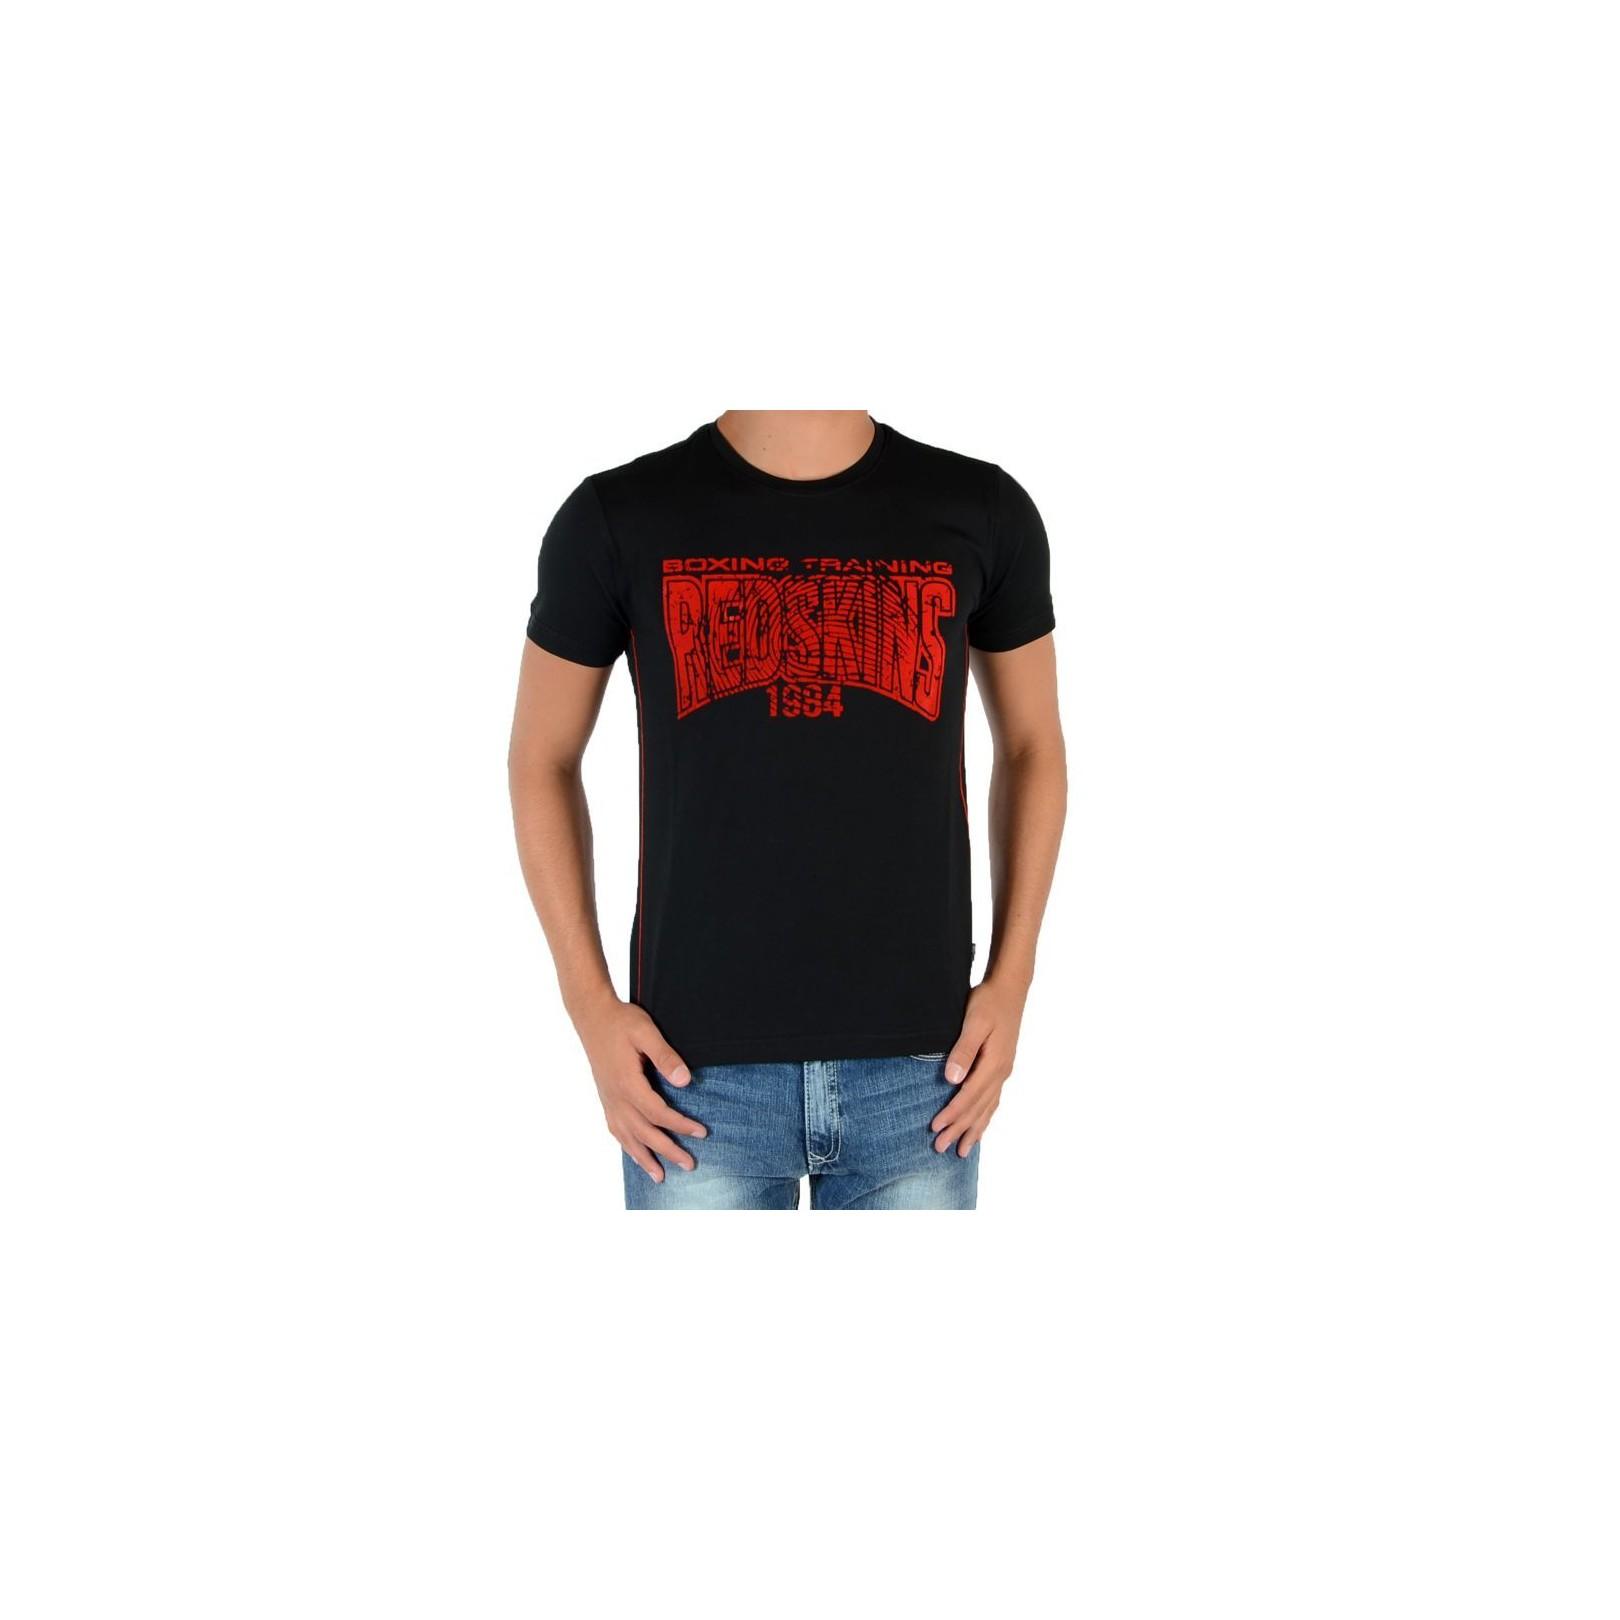 4188be64 Tee Shirt Redskins Junior Boston Noir / Rouge - Galerie-Chic